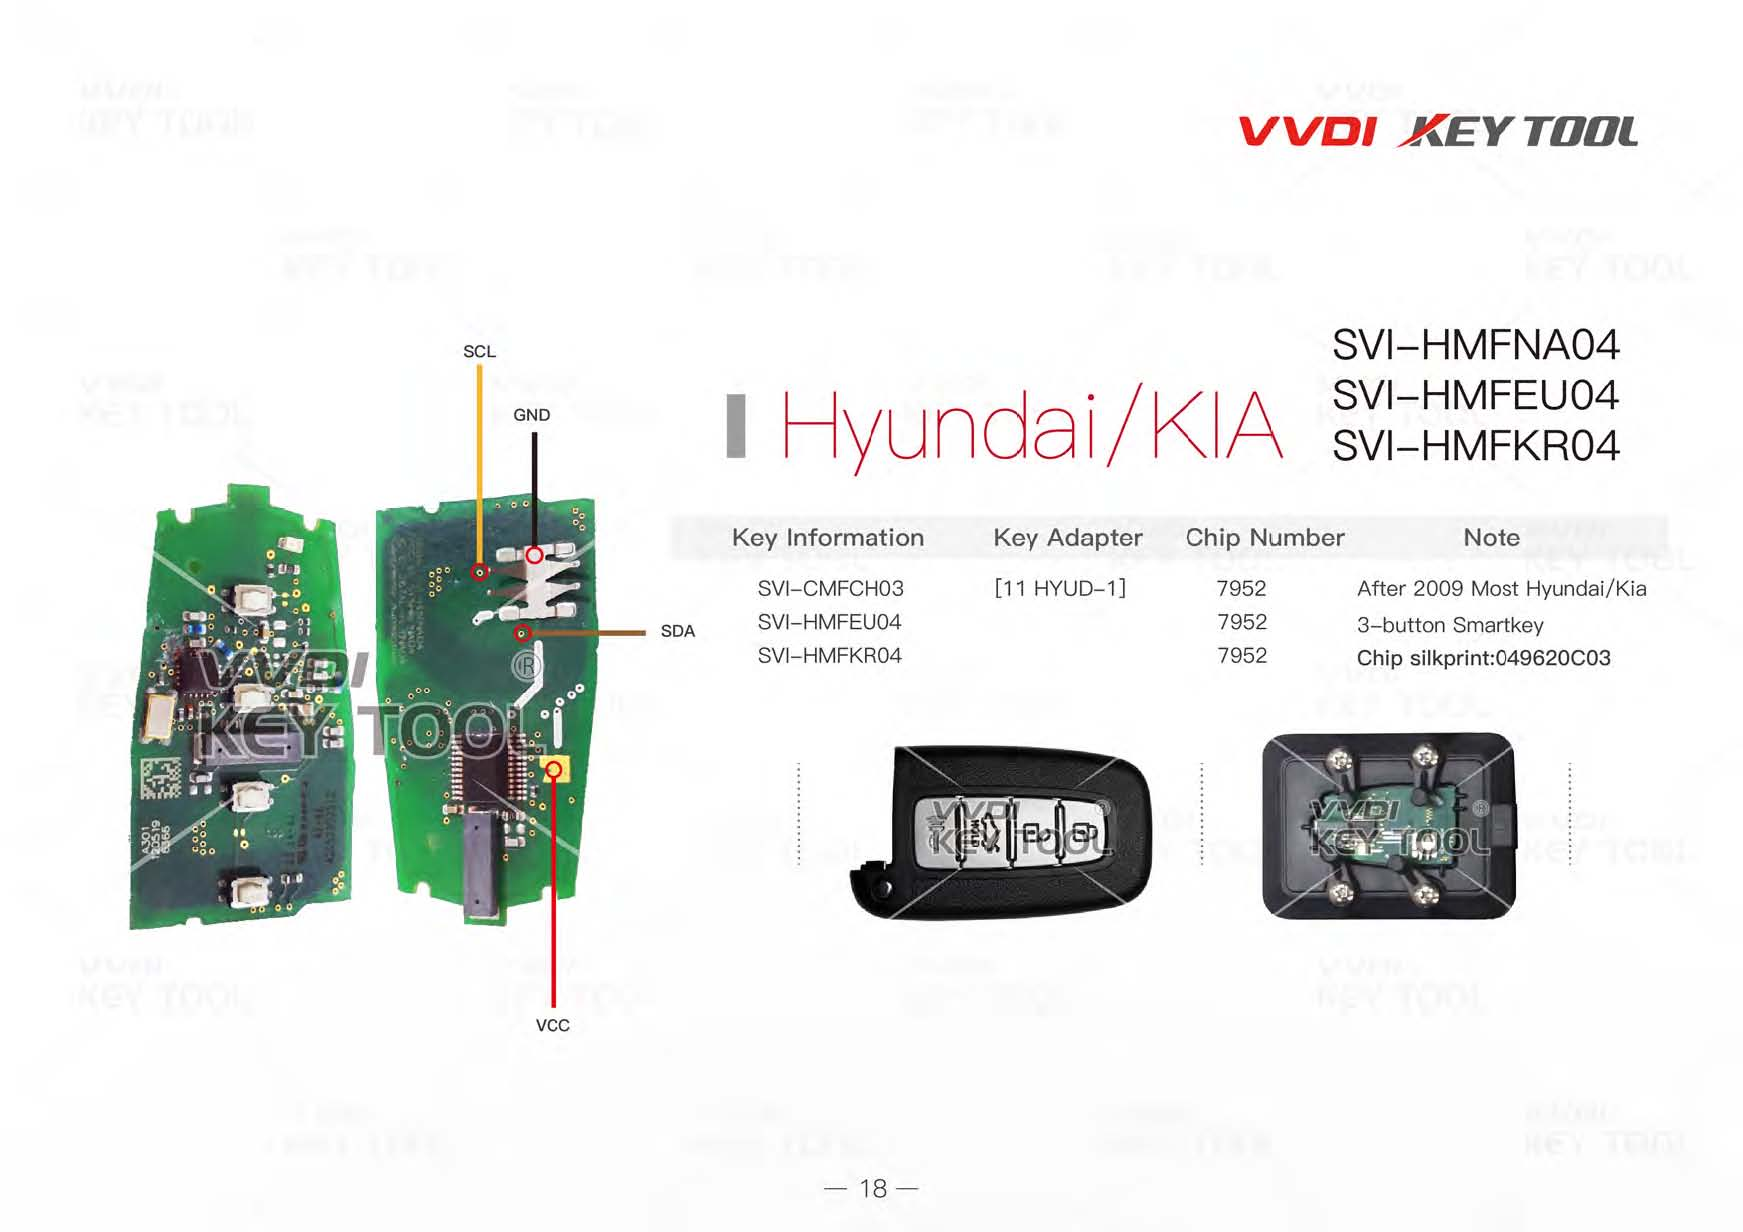 free wiring diagram tool er for leave management system vvdi key remote unlock all here